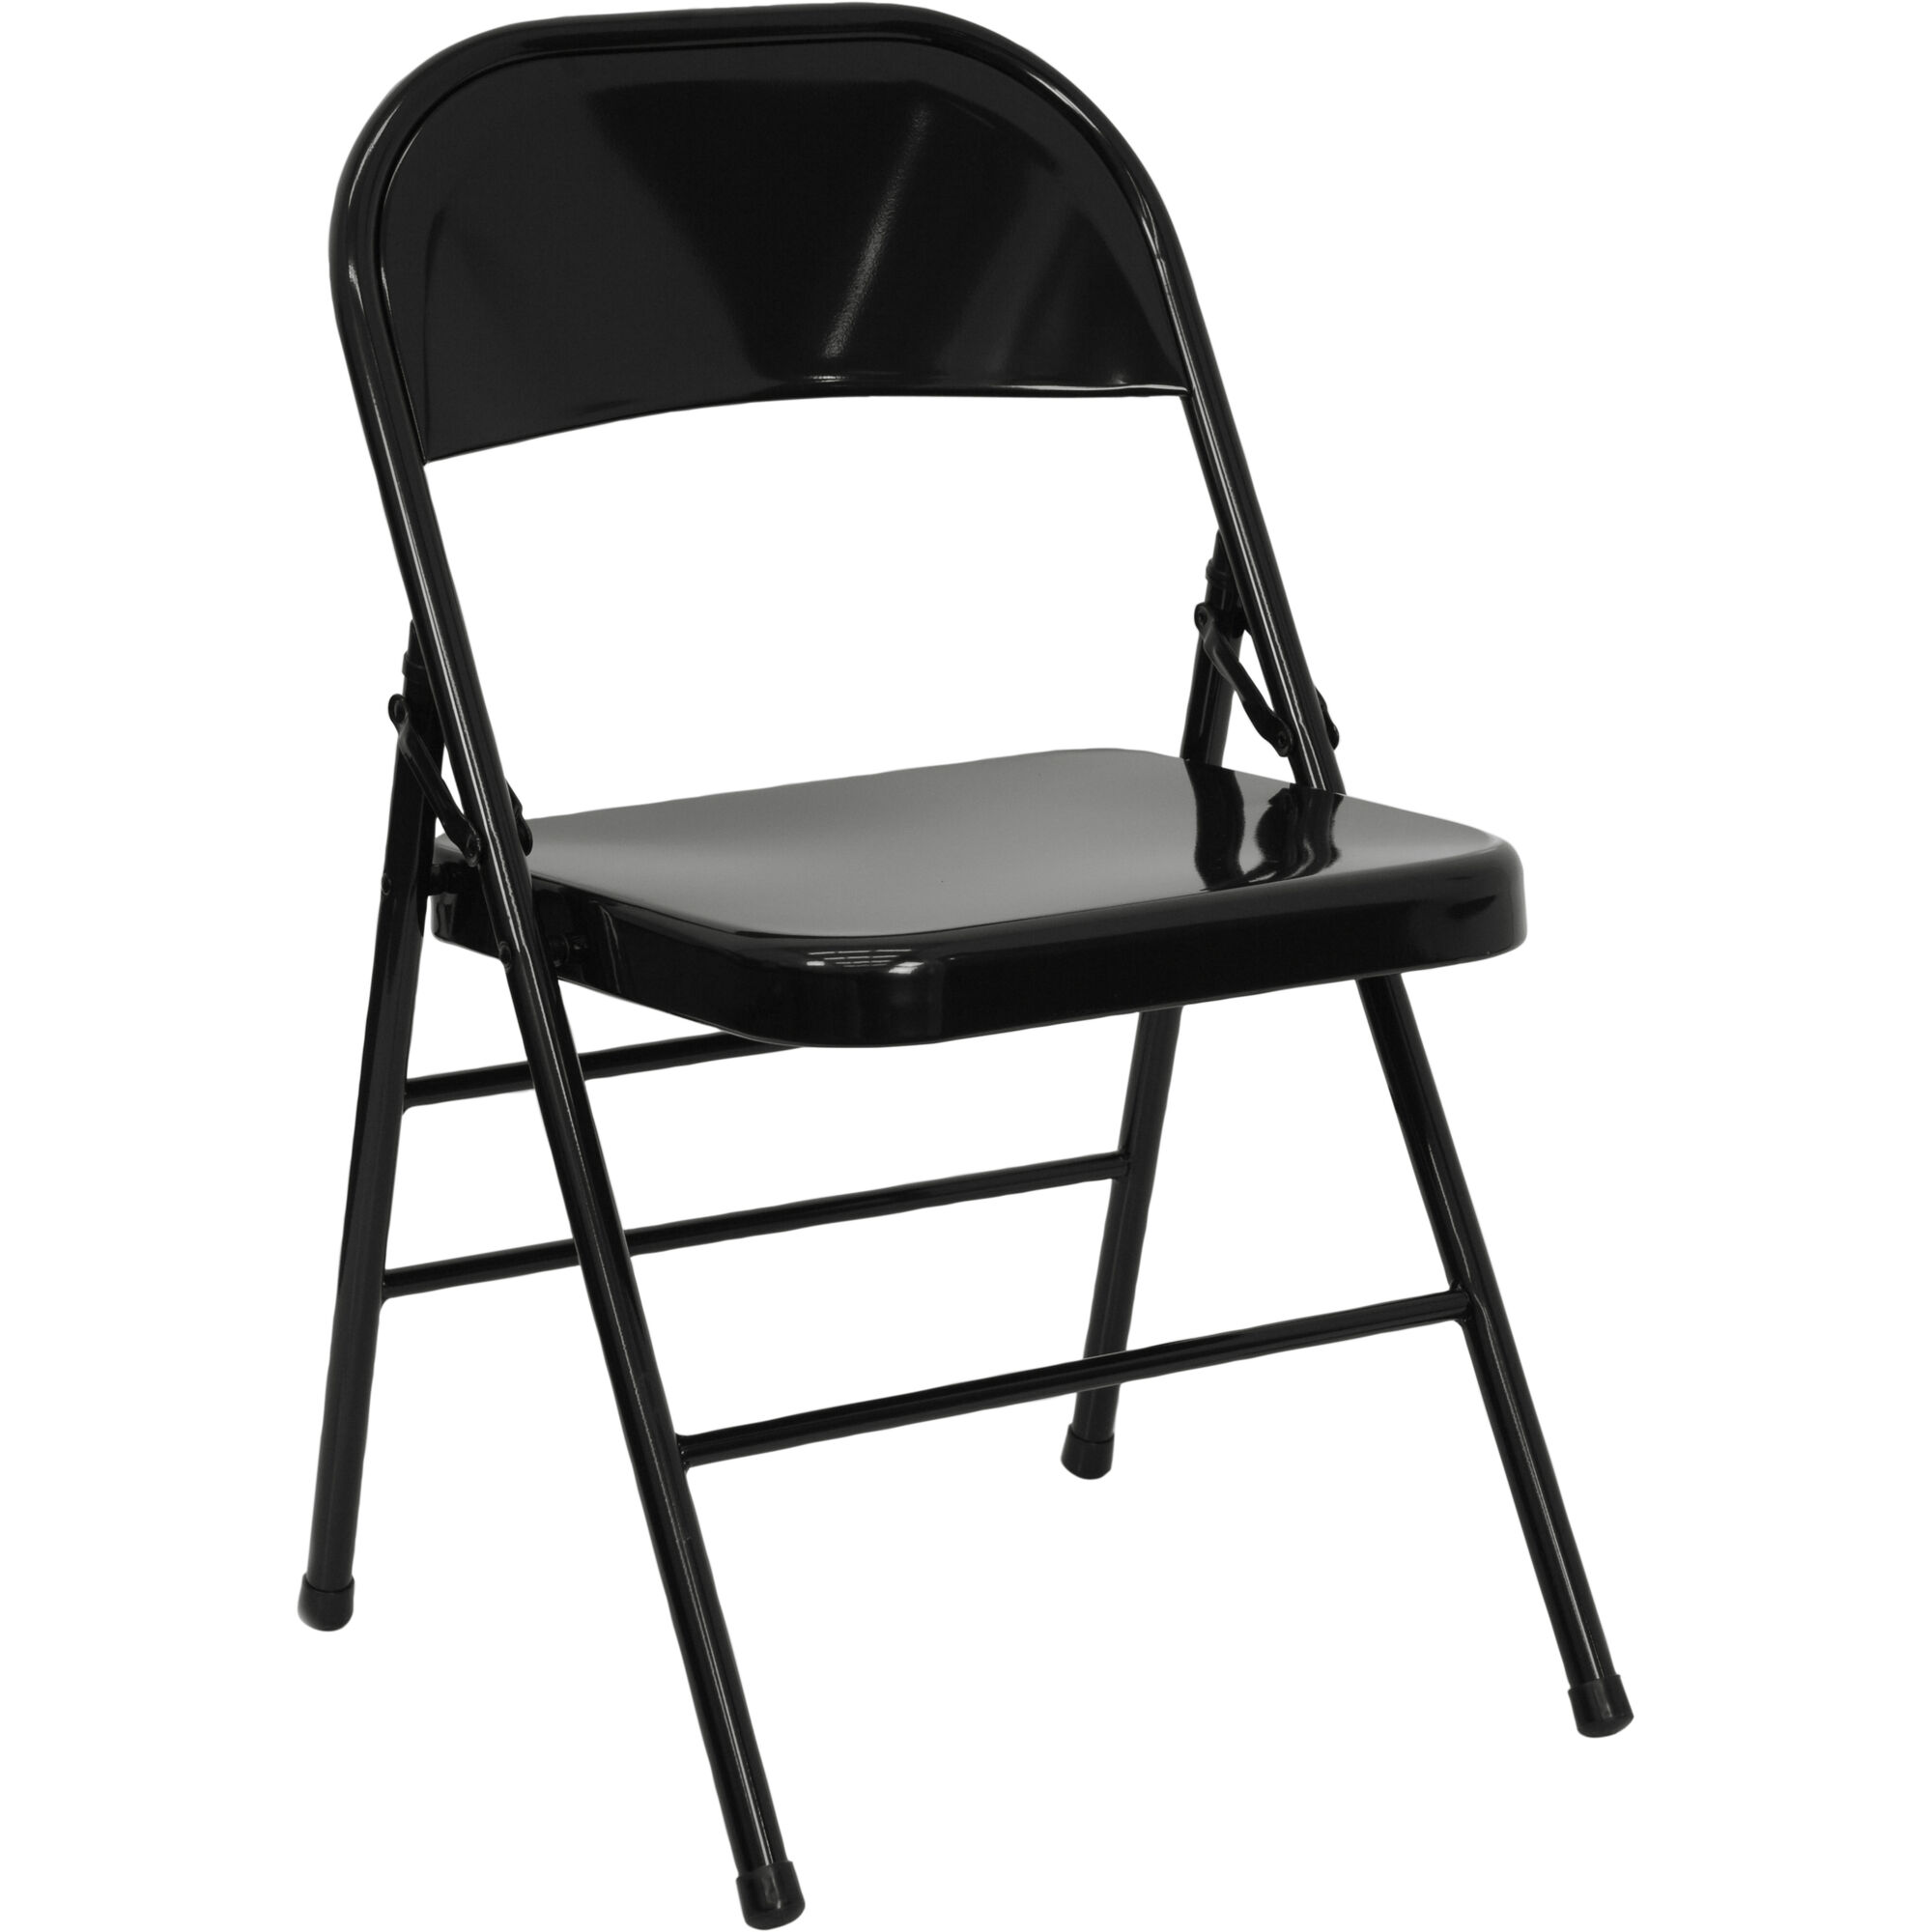 FoldingChairLess Metal Folding Chairs Plastic Folding Chairs